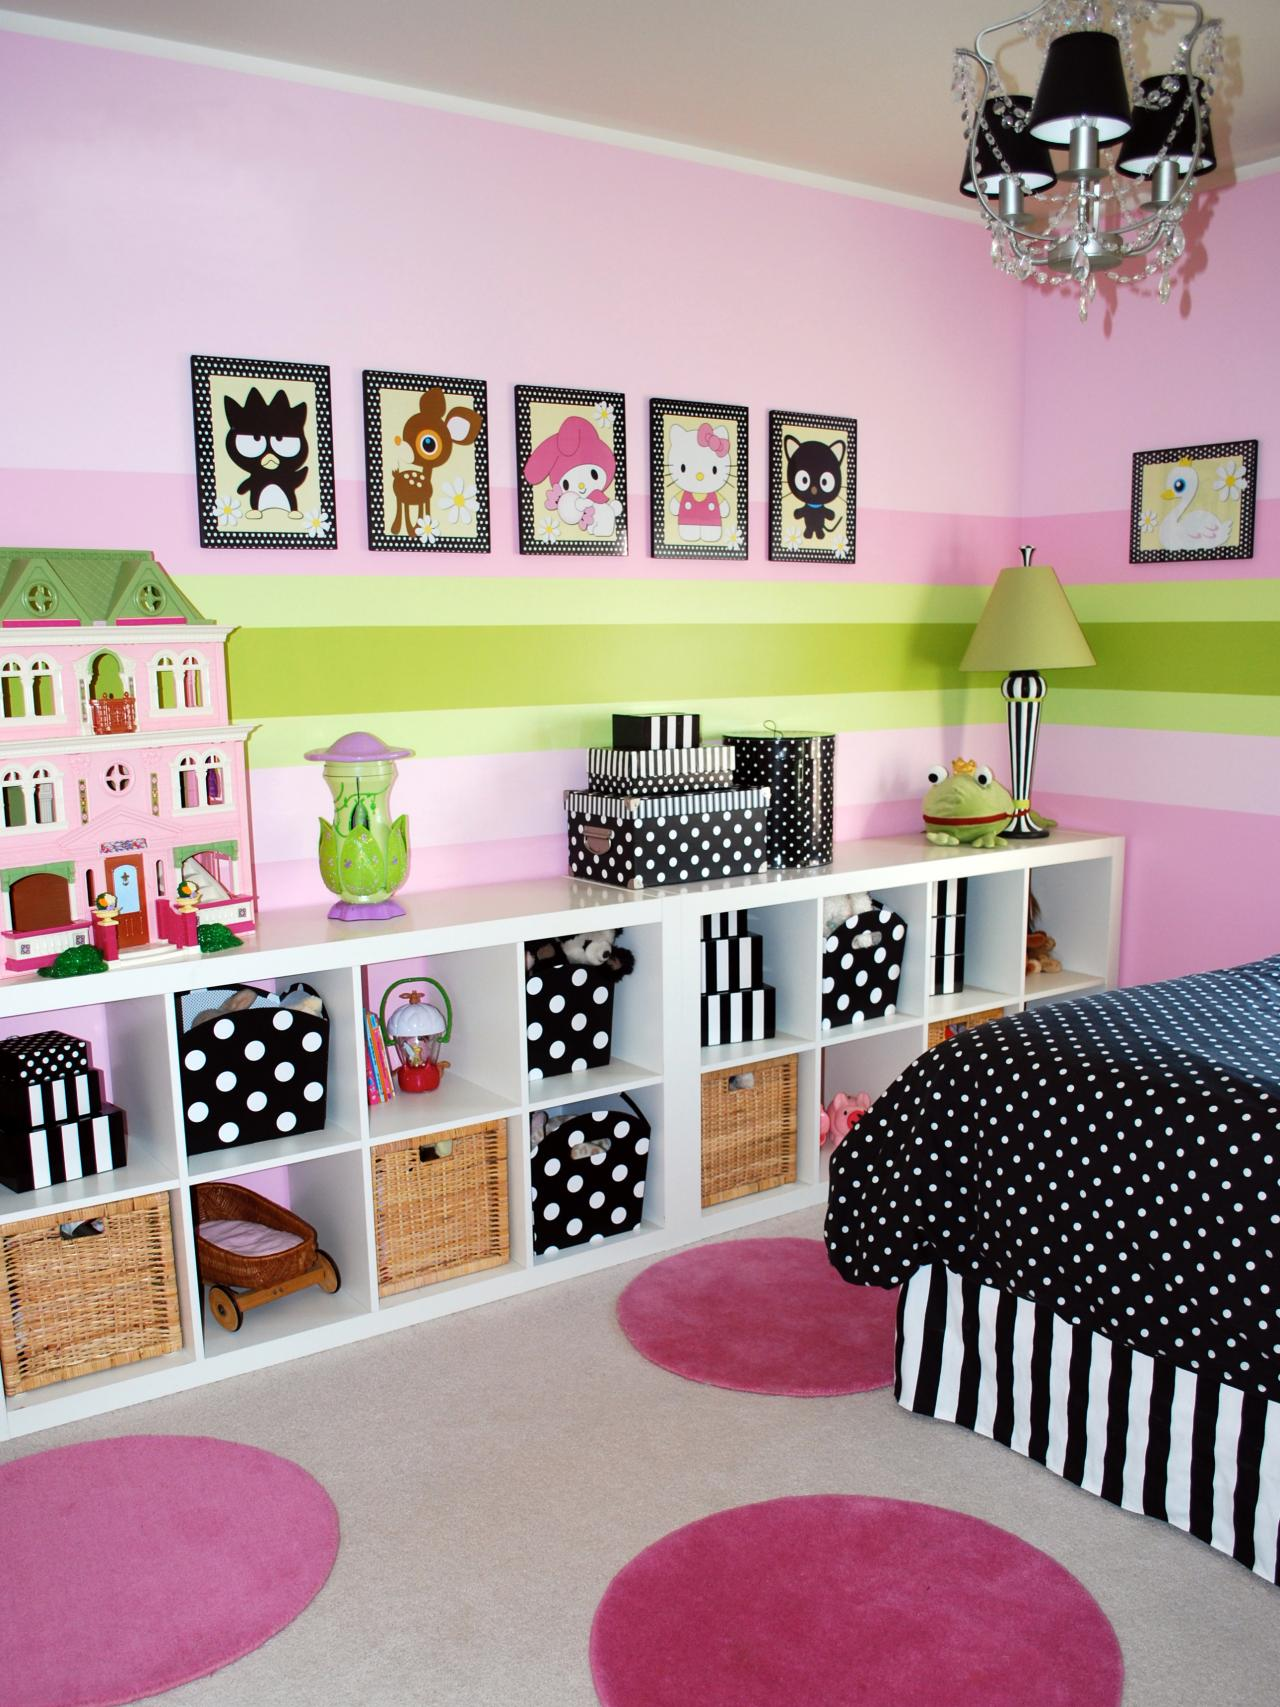 Creative Traditional Kids Room Design